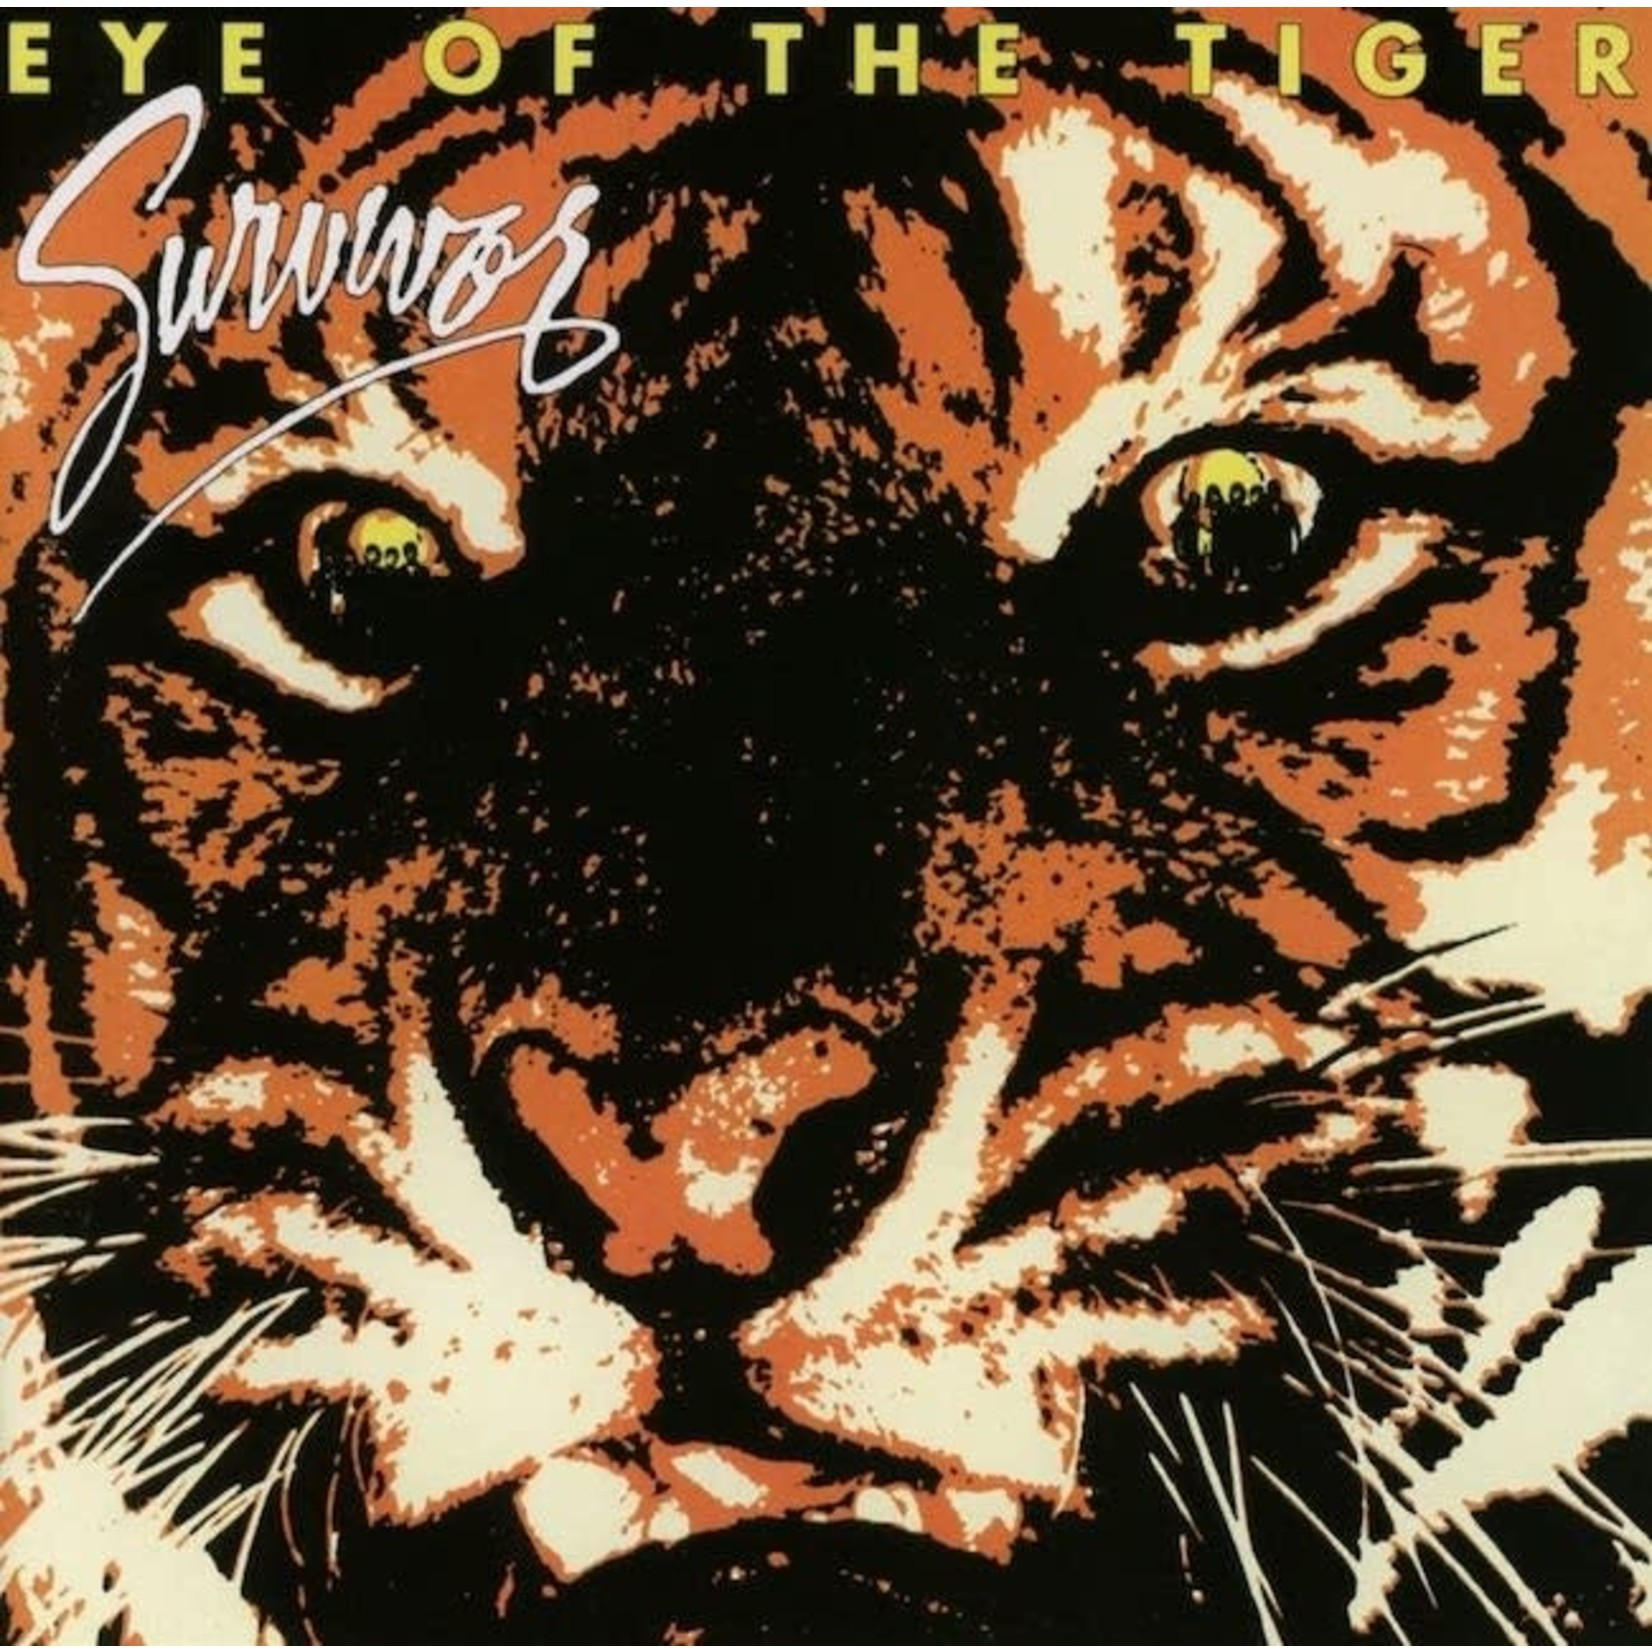 [Vintage] Survivor: Eye of the Tiger